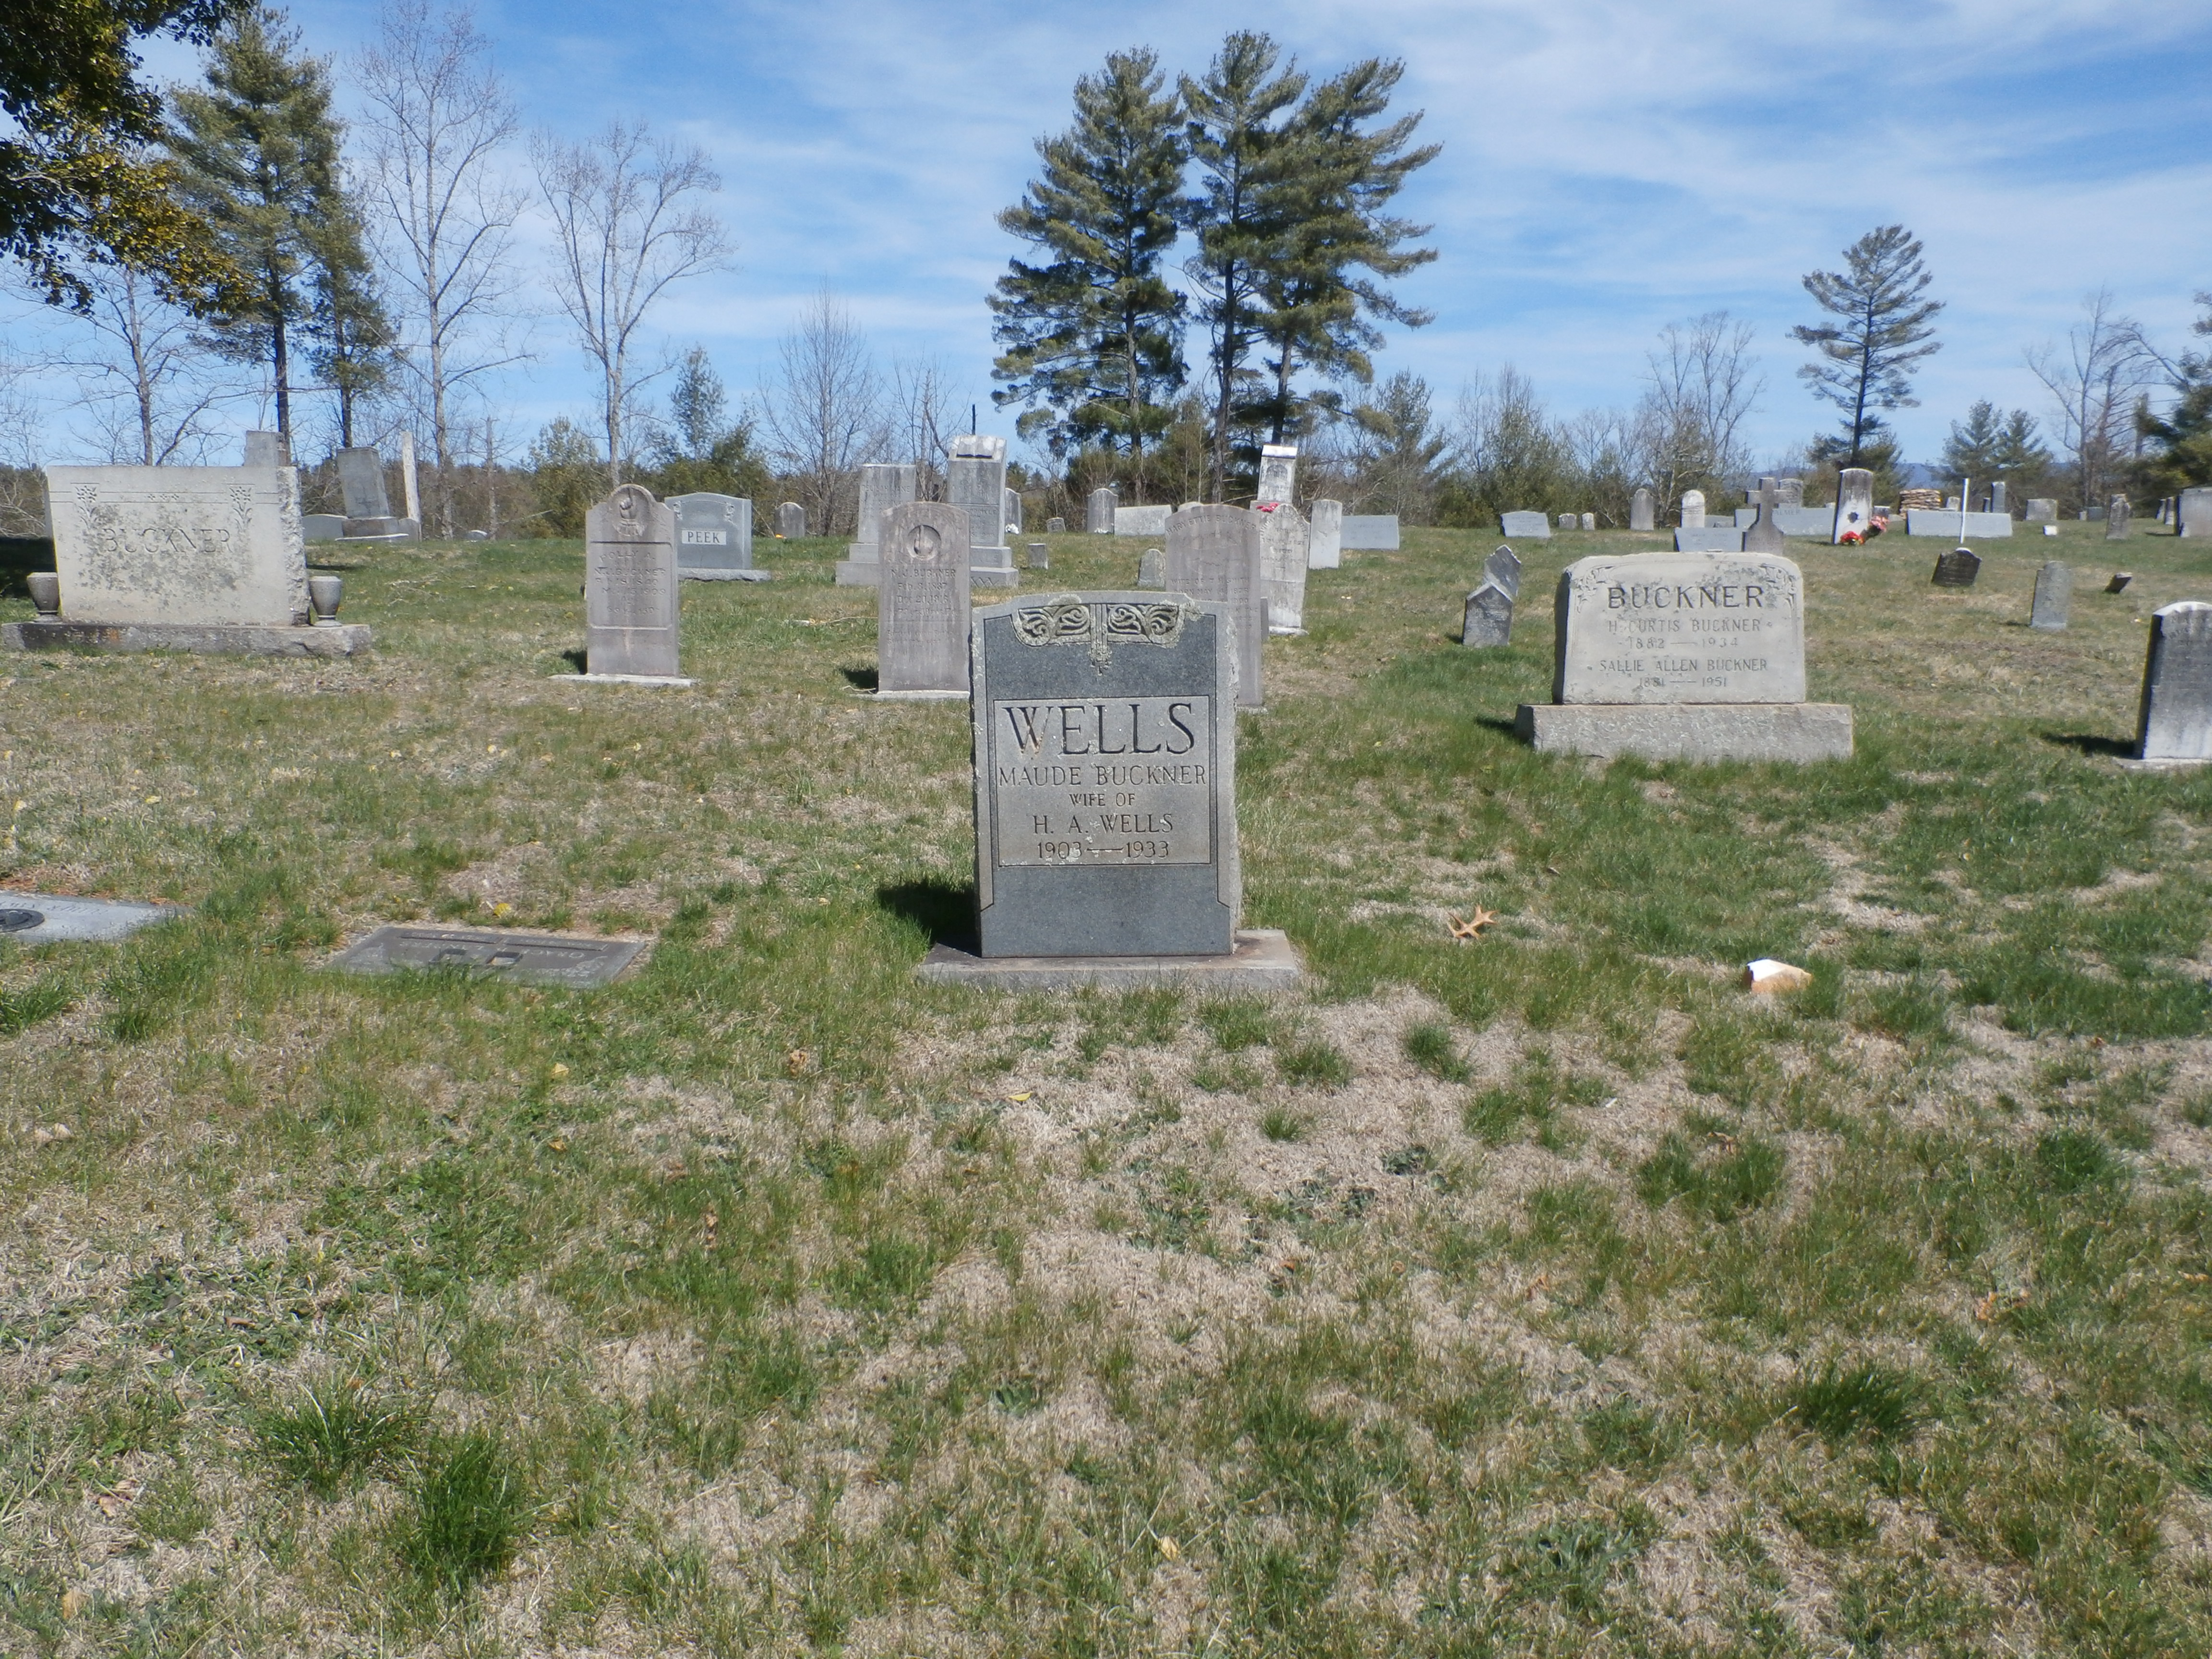 Gabriel's Creek Baptist Church Cemetery